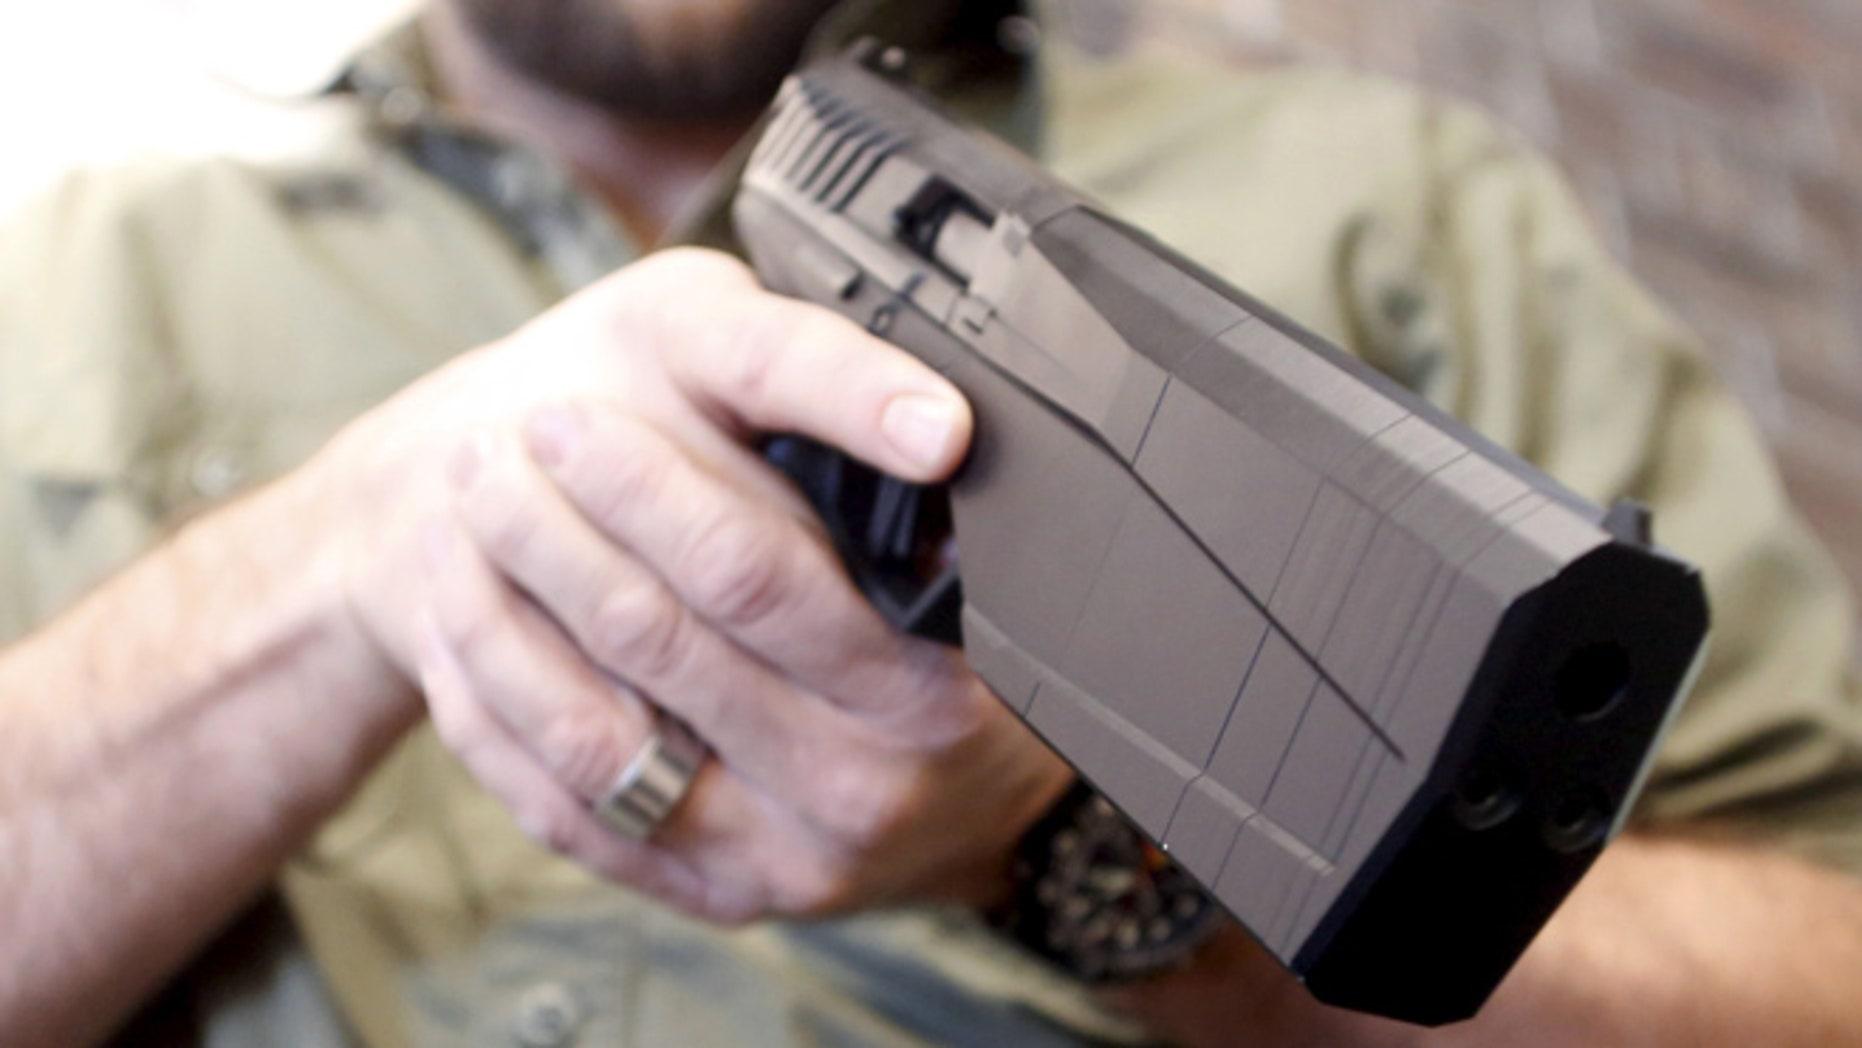 FILE: Feb. 23, 2016: SilencerCo CEO Joshua Waldron cradles a handgun with a built-in suppressor. West Valley City, Utah. (Reuters)